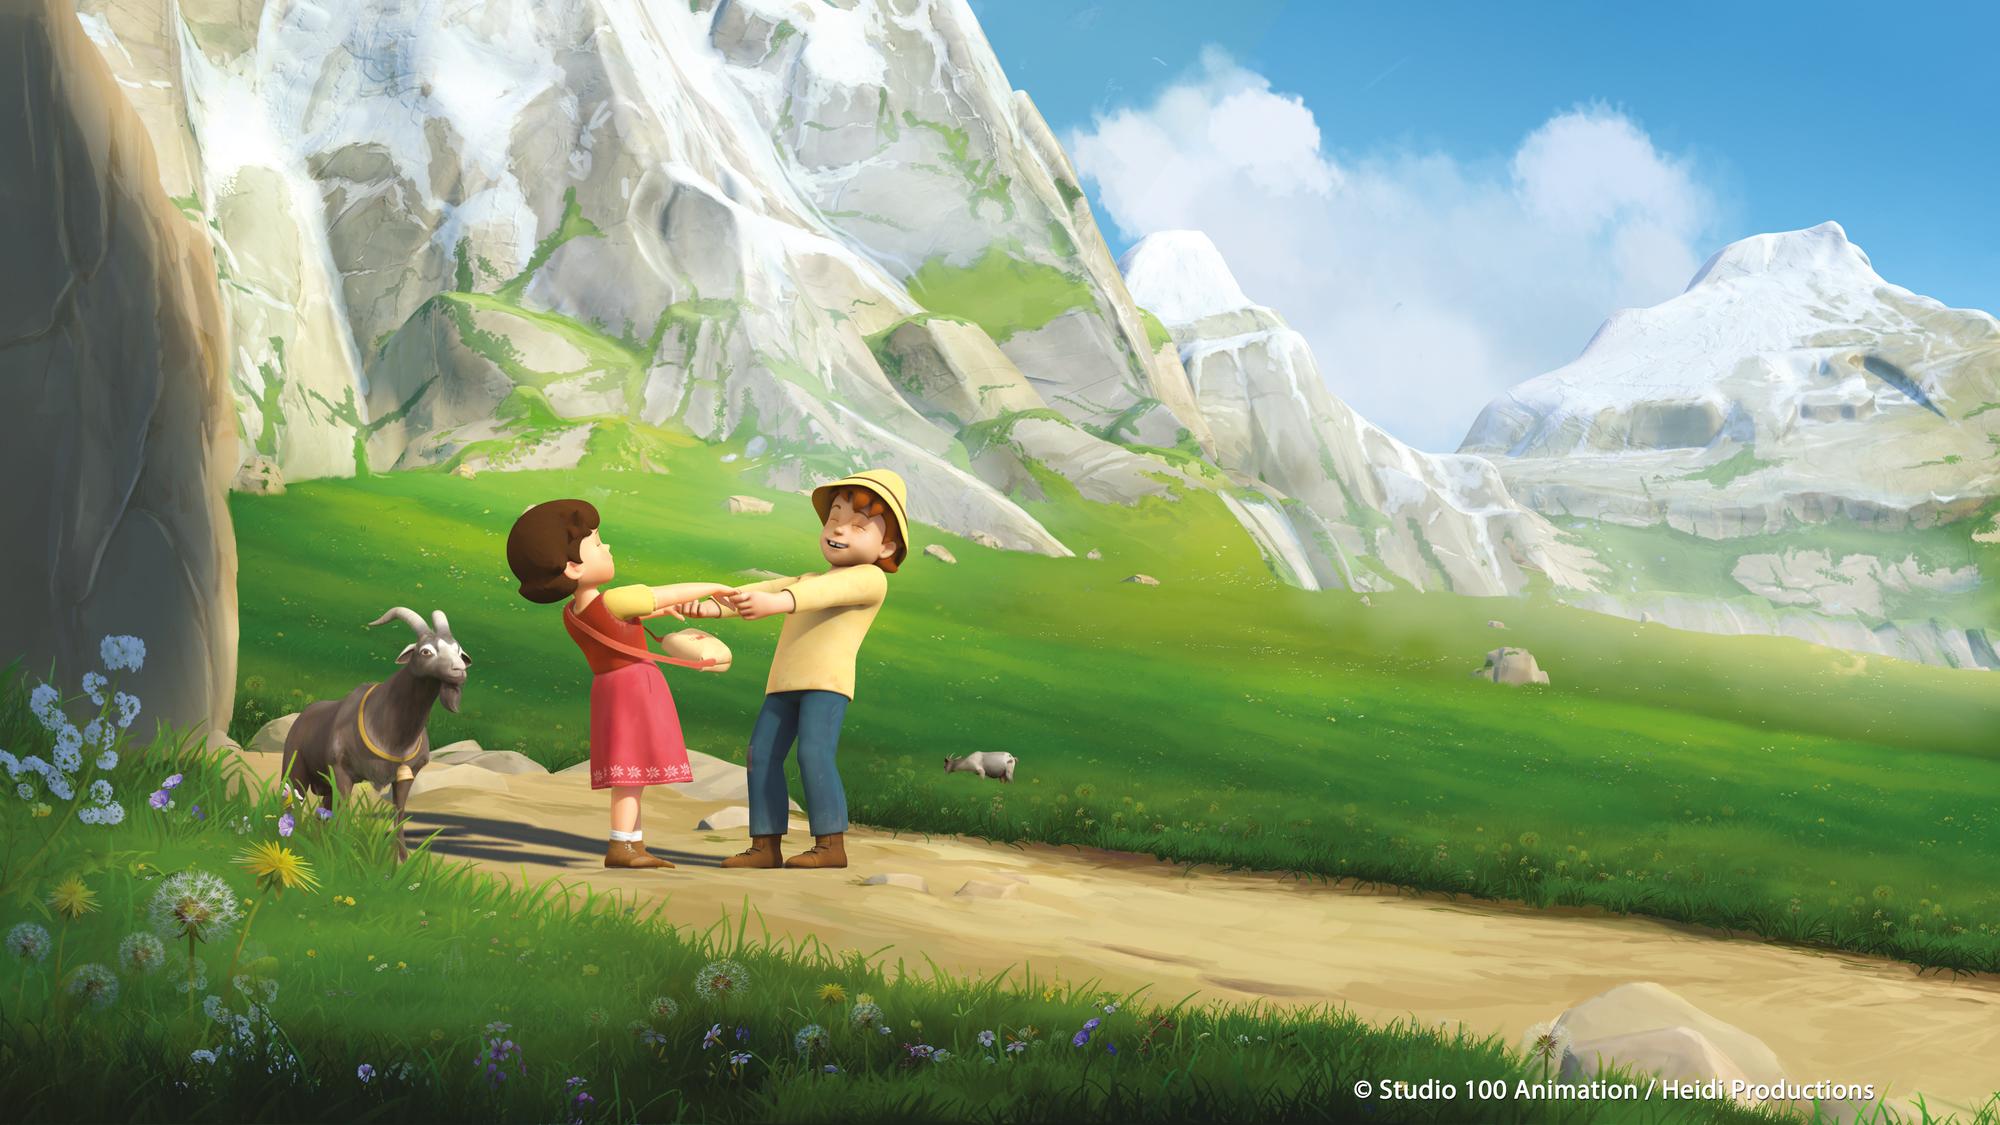 Heidi - Studio 100 Animation